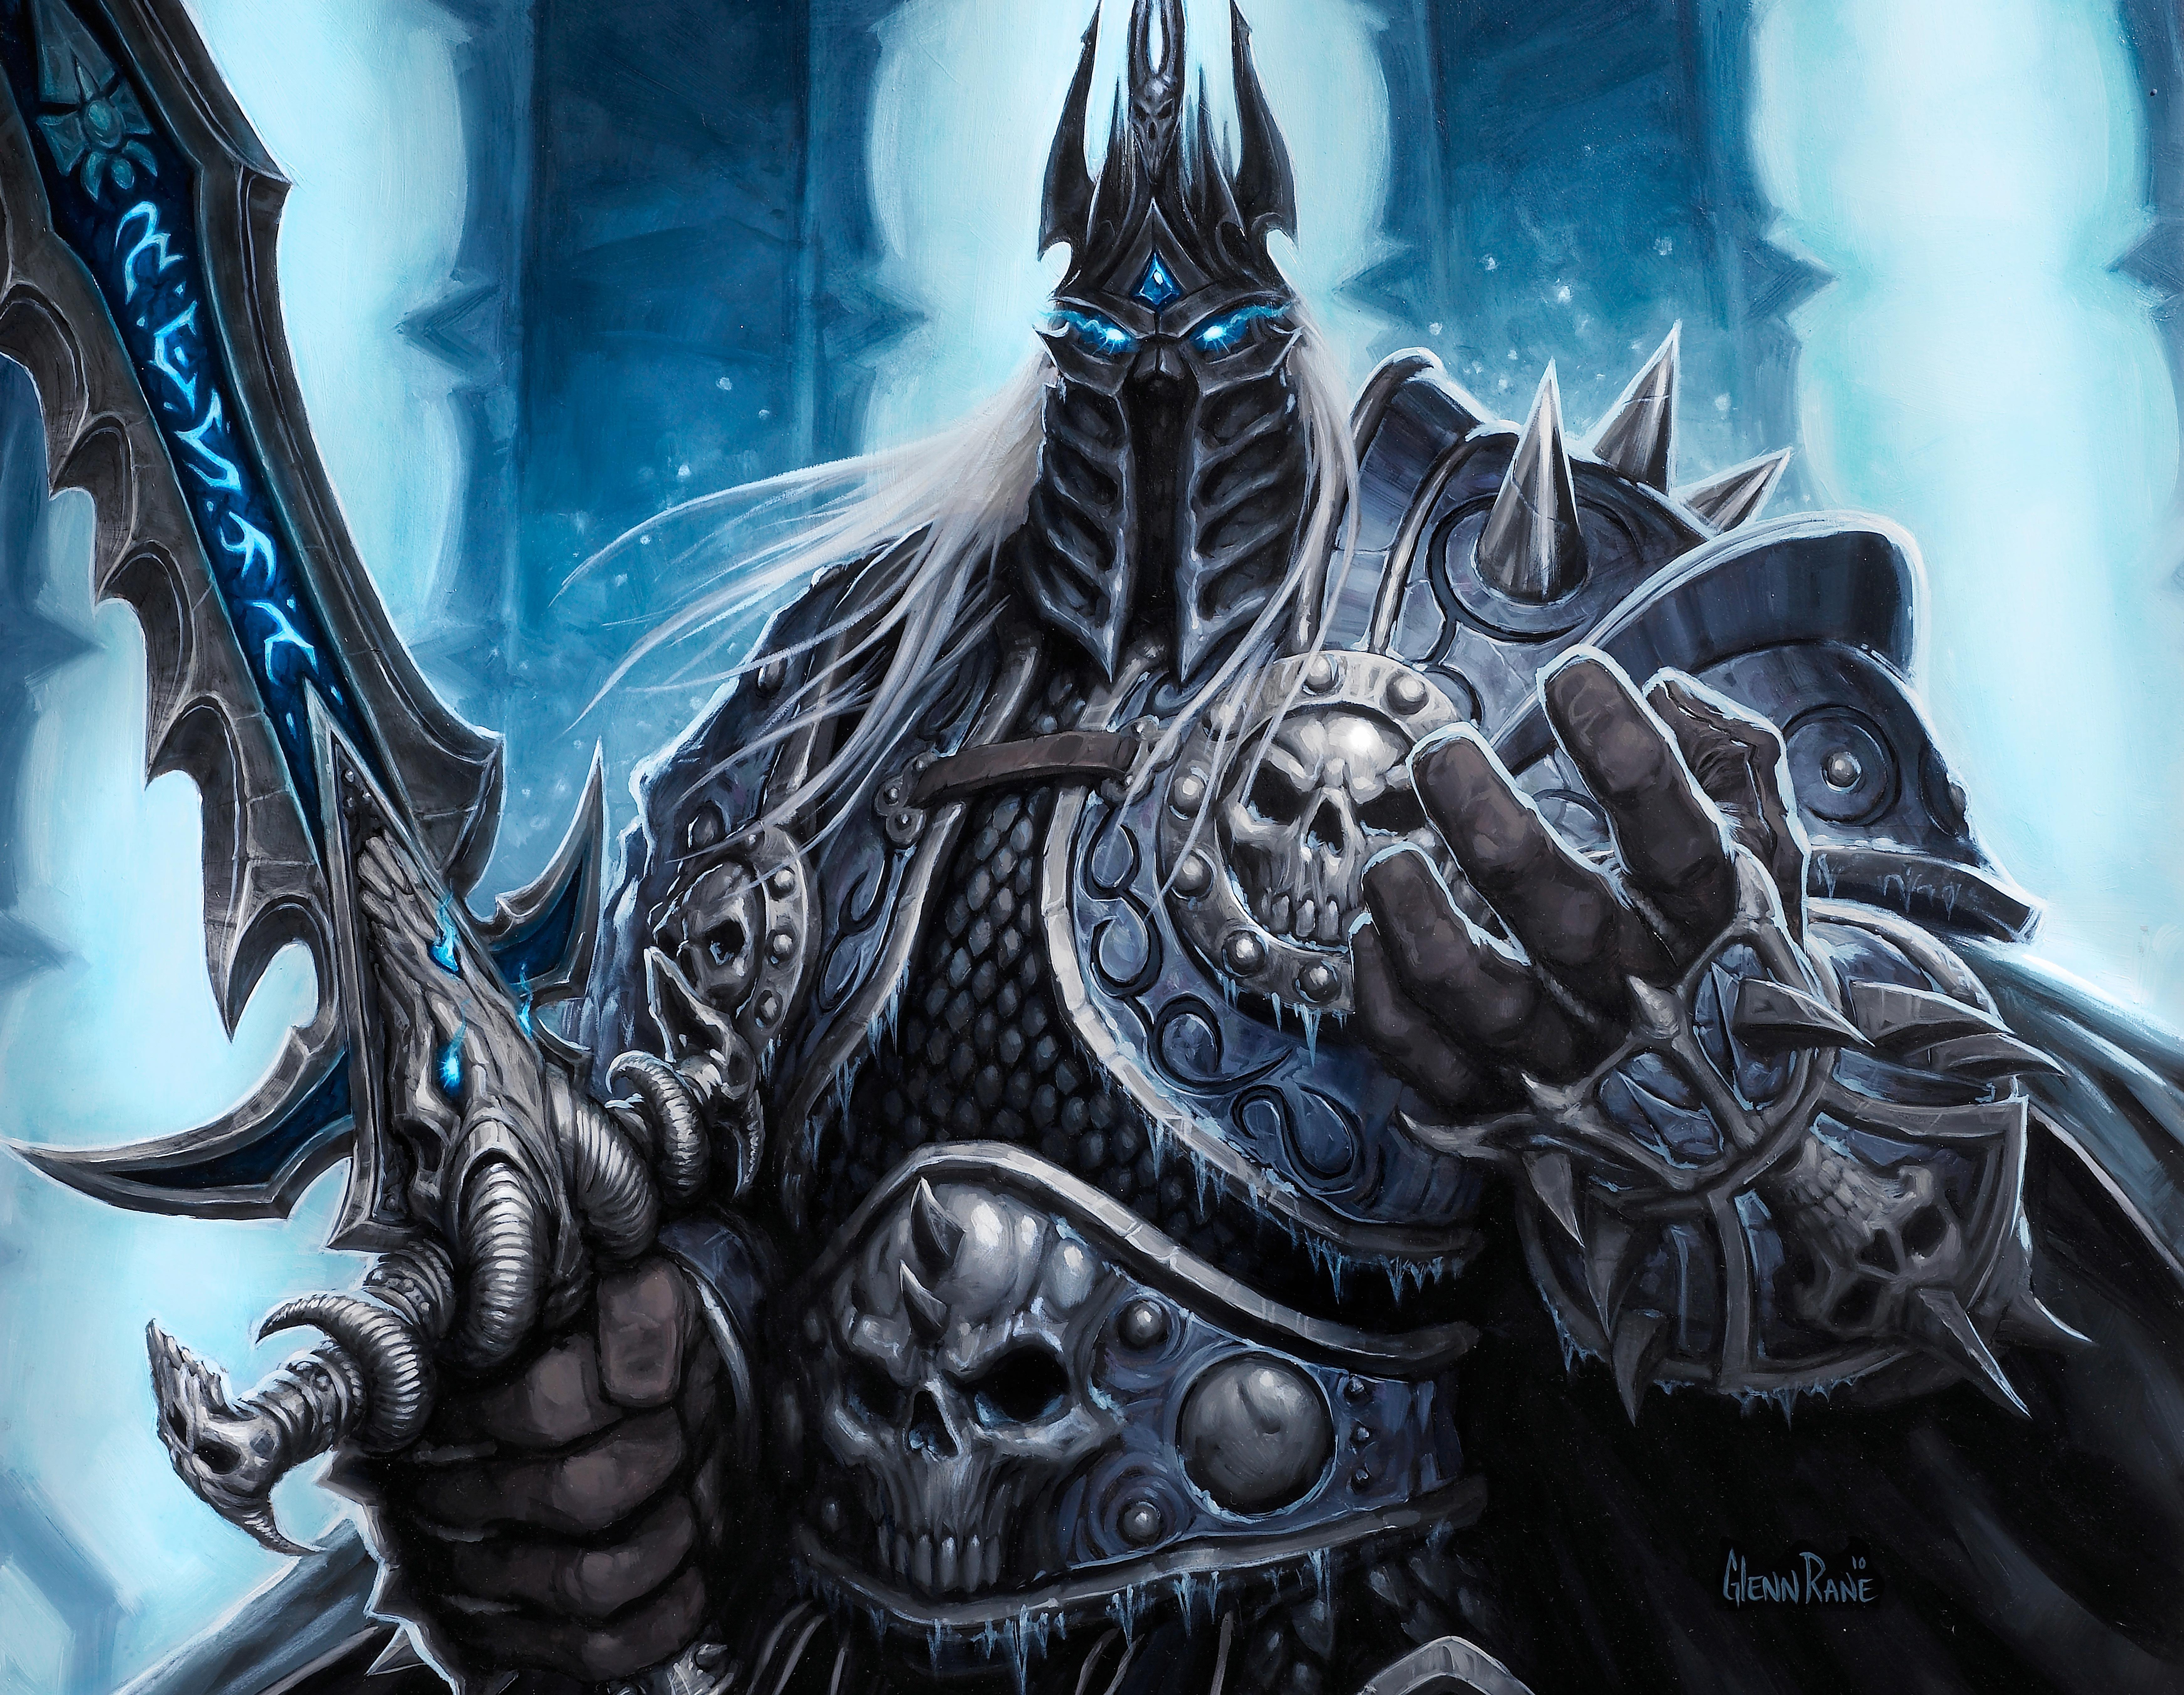 World Of Warcraft The Dark Portal Uhd 4k Wallpaper: Lich King World Of Warcraft 4k 5k, HD Games, 4k Wallpapers